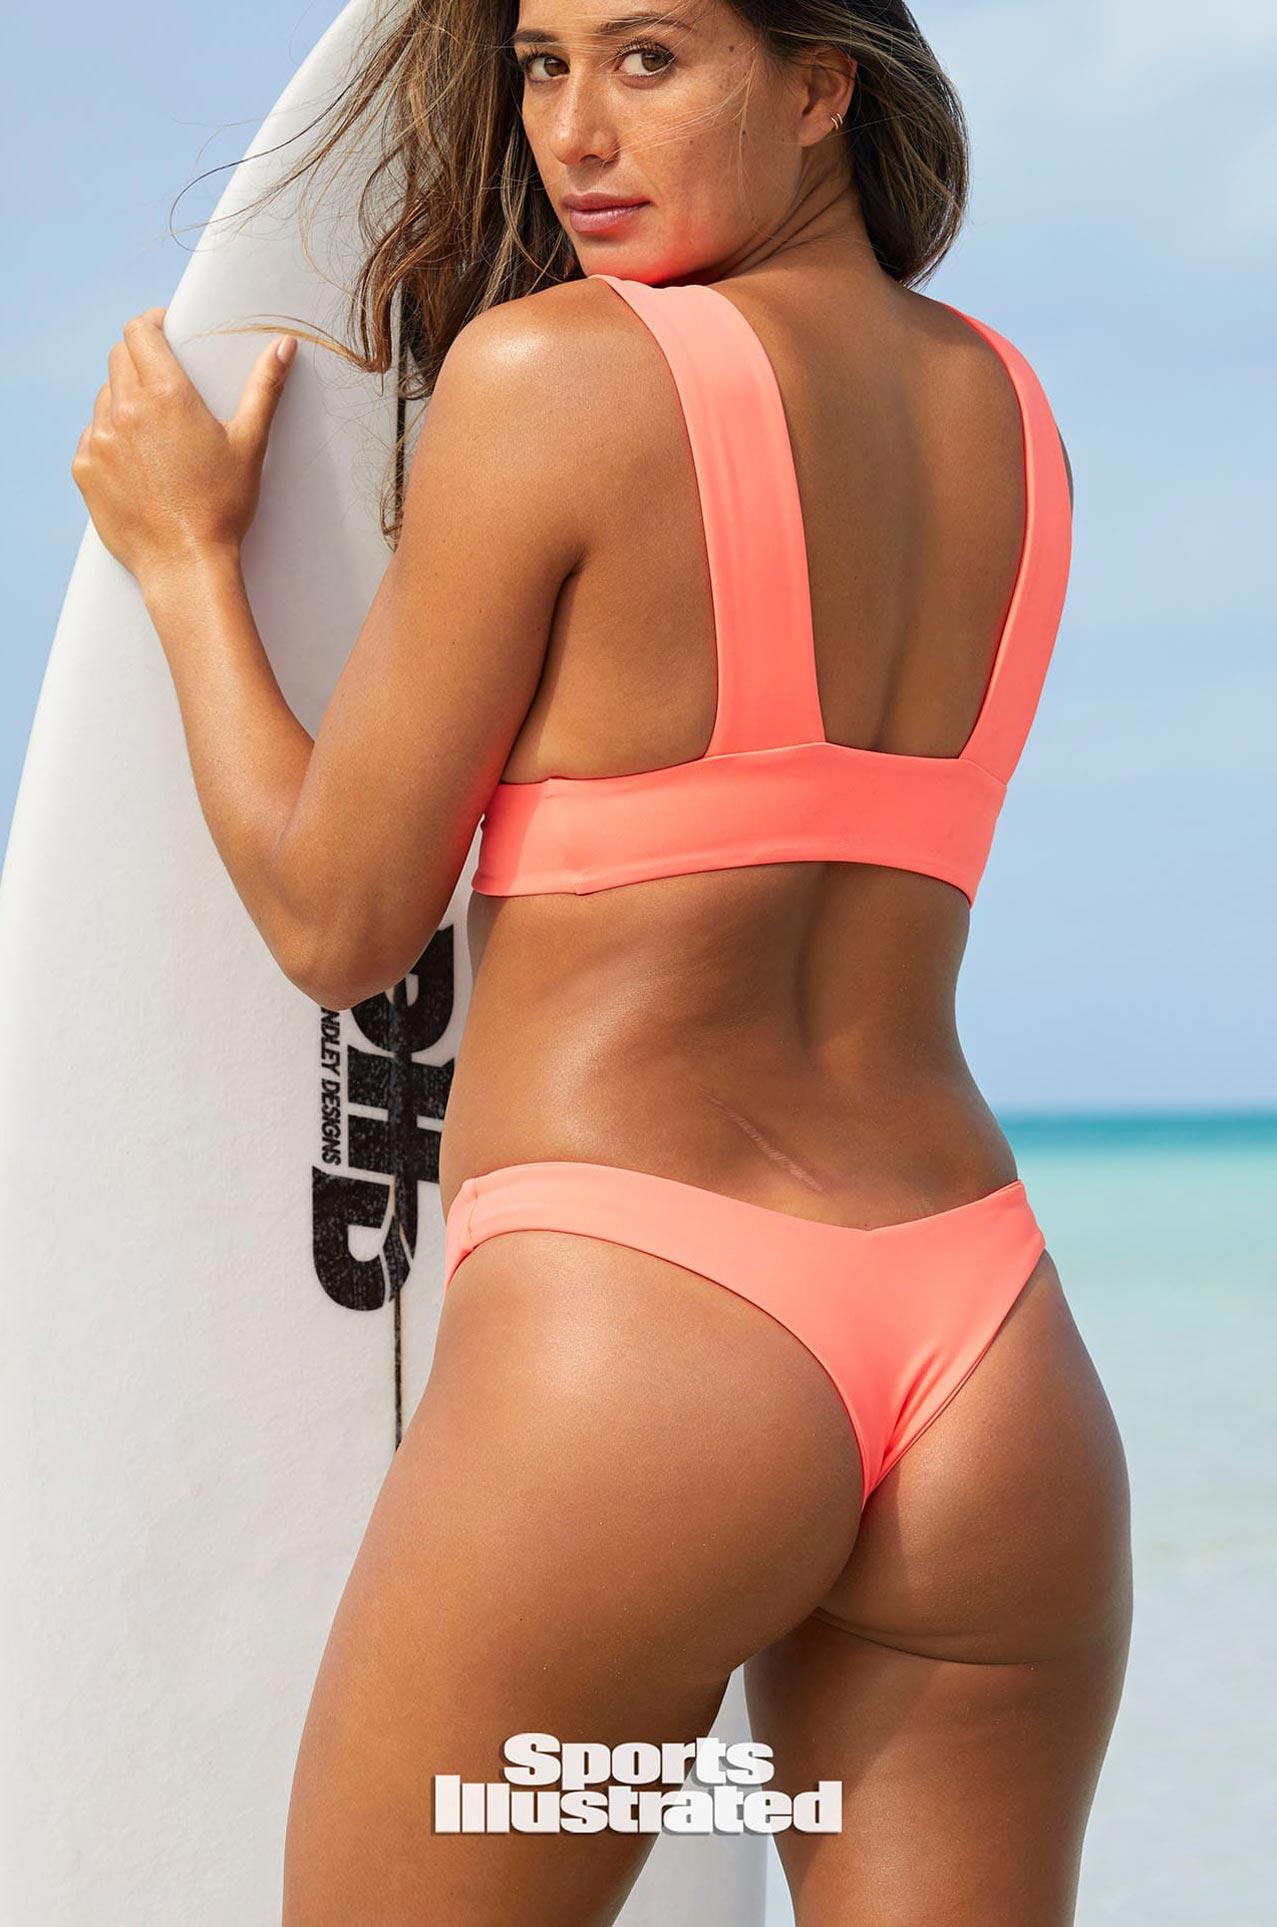 Малия Мануэль в каталоге купальников Sports Illustrated Swimsuit 2020 / фото 14